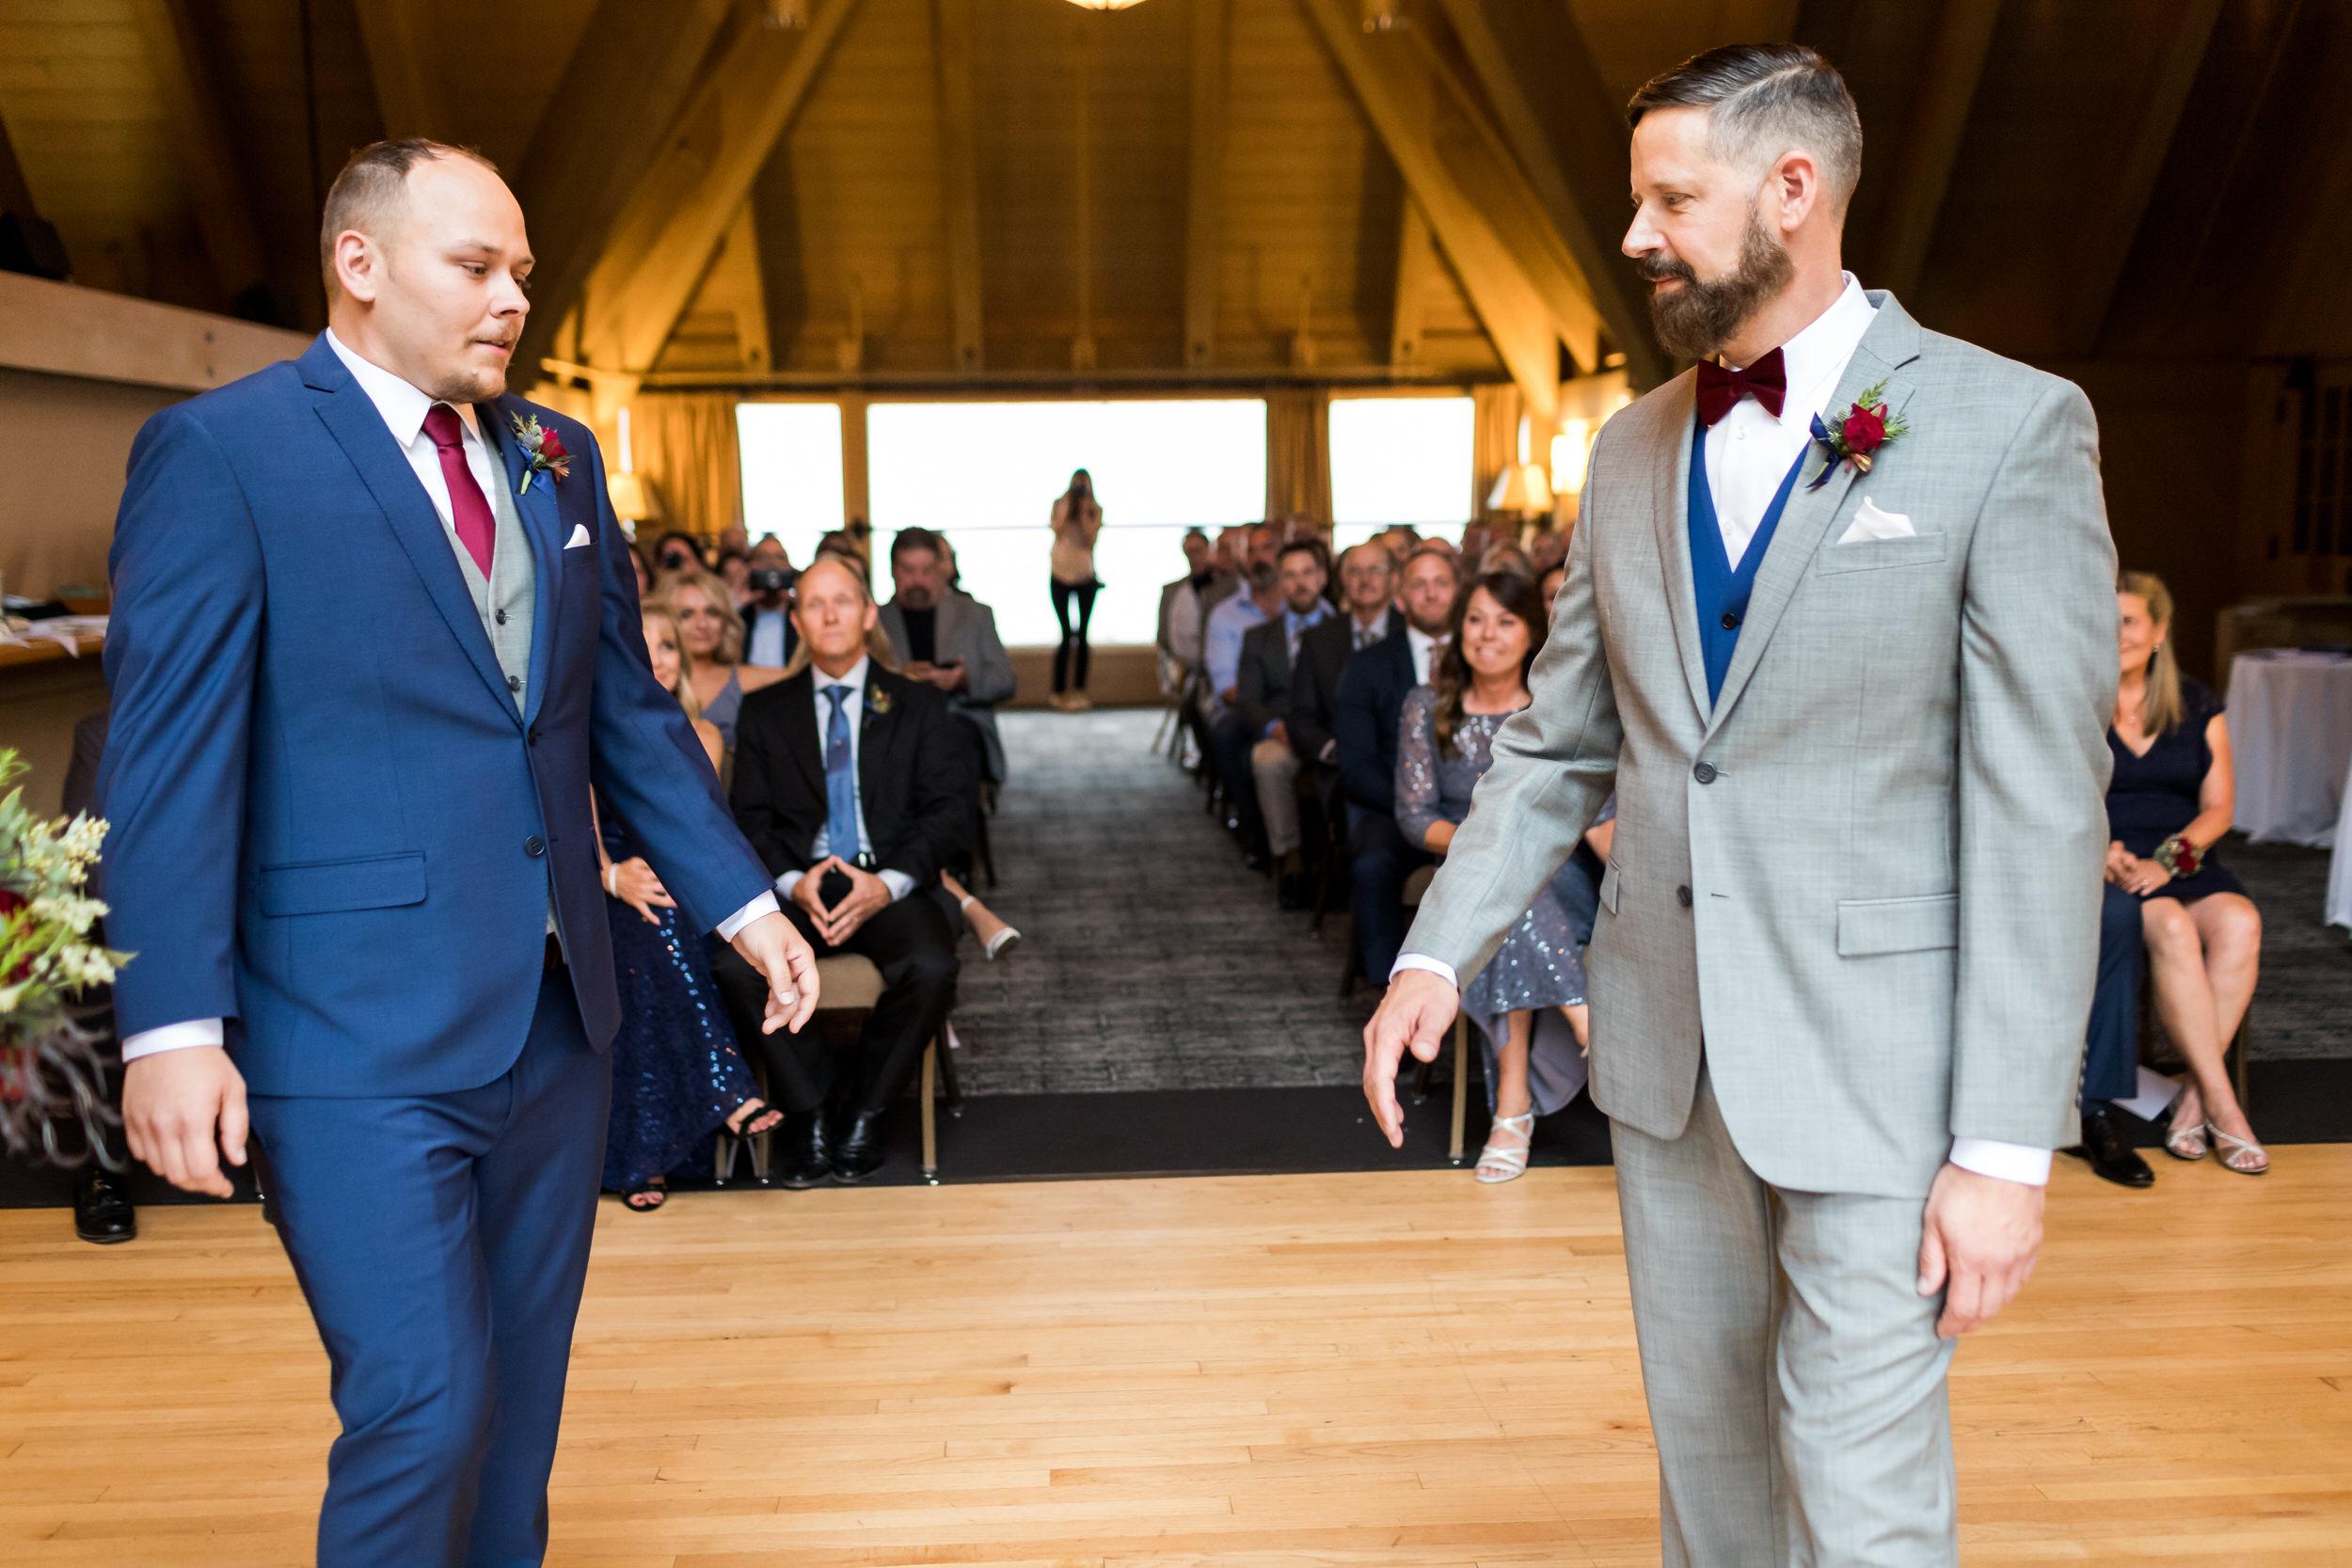 timberline_lodge_wedding_JCwedding_002